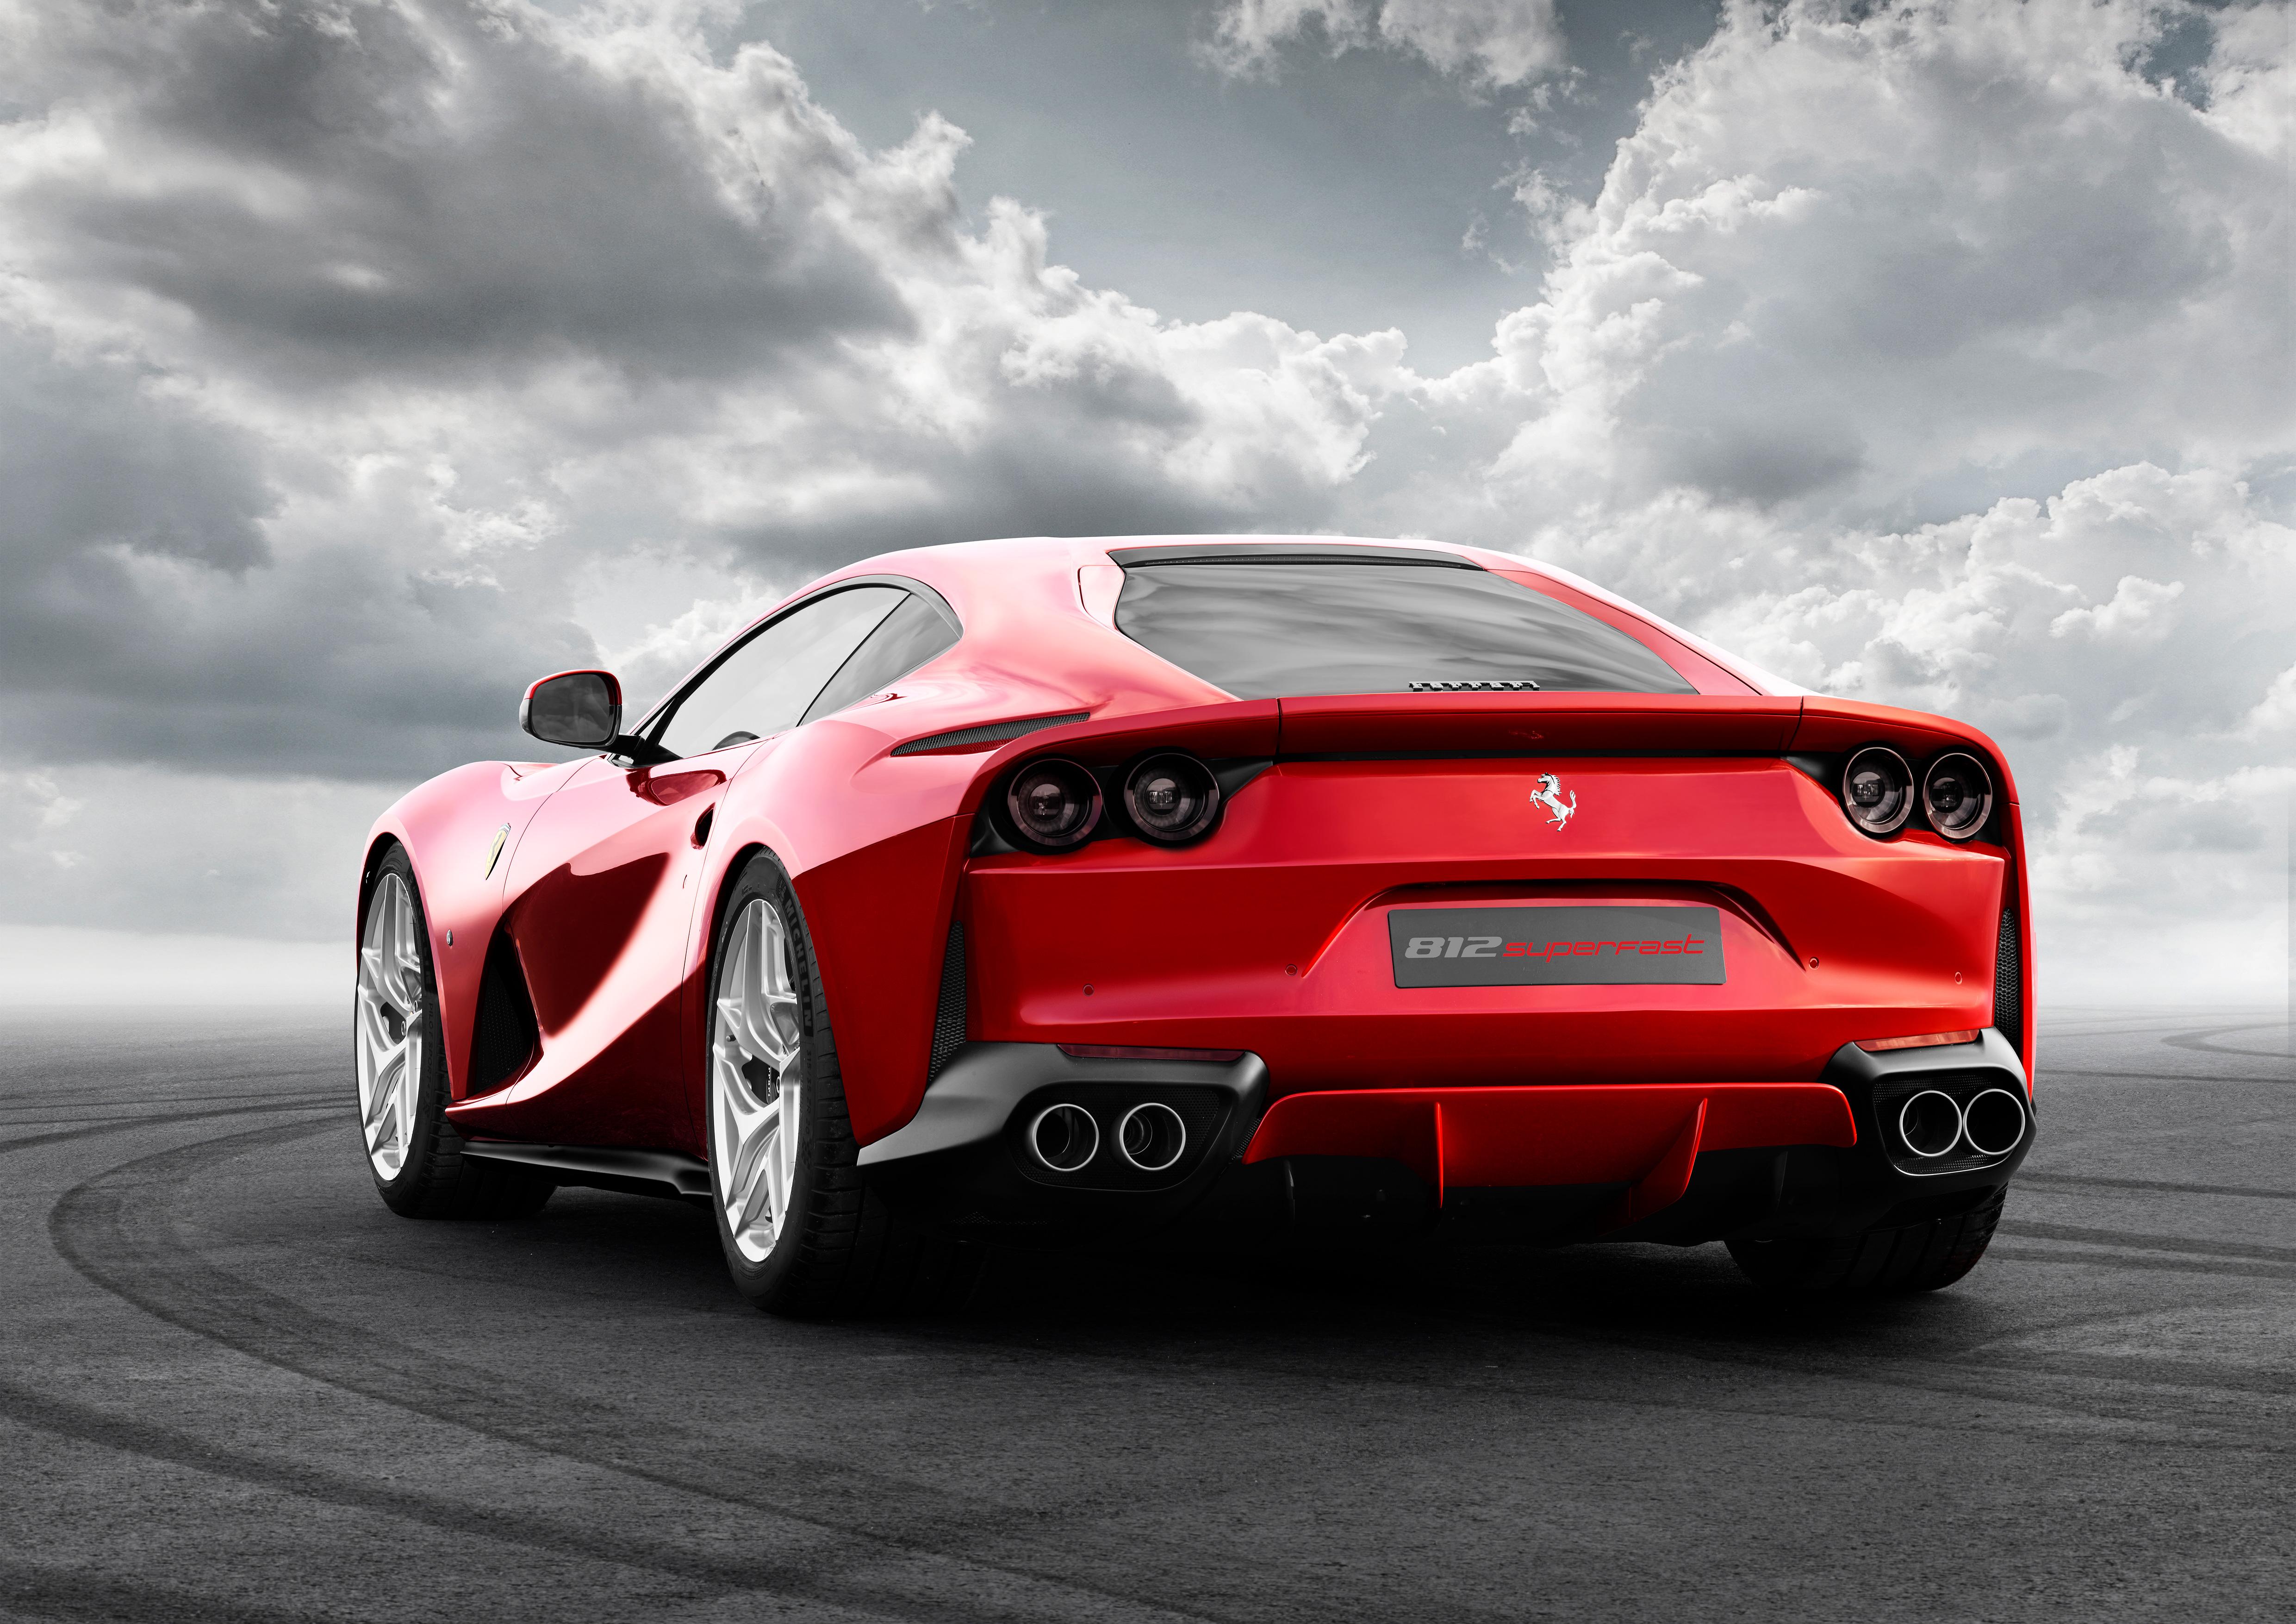 2018 Ferrari 812 Superfast, HD Cars, 4k Wallpapers, Images ...